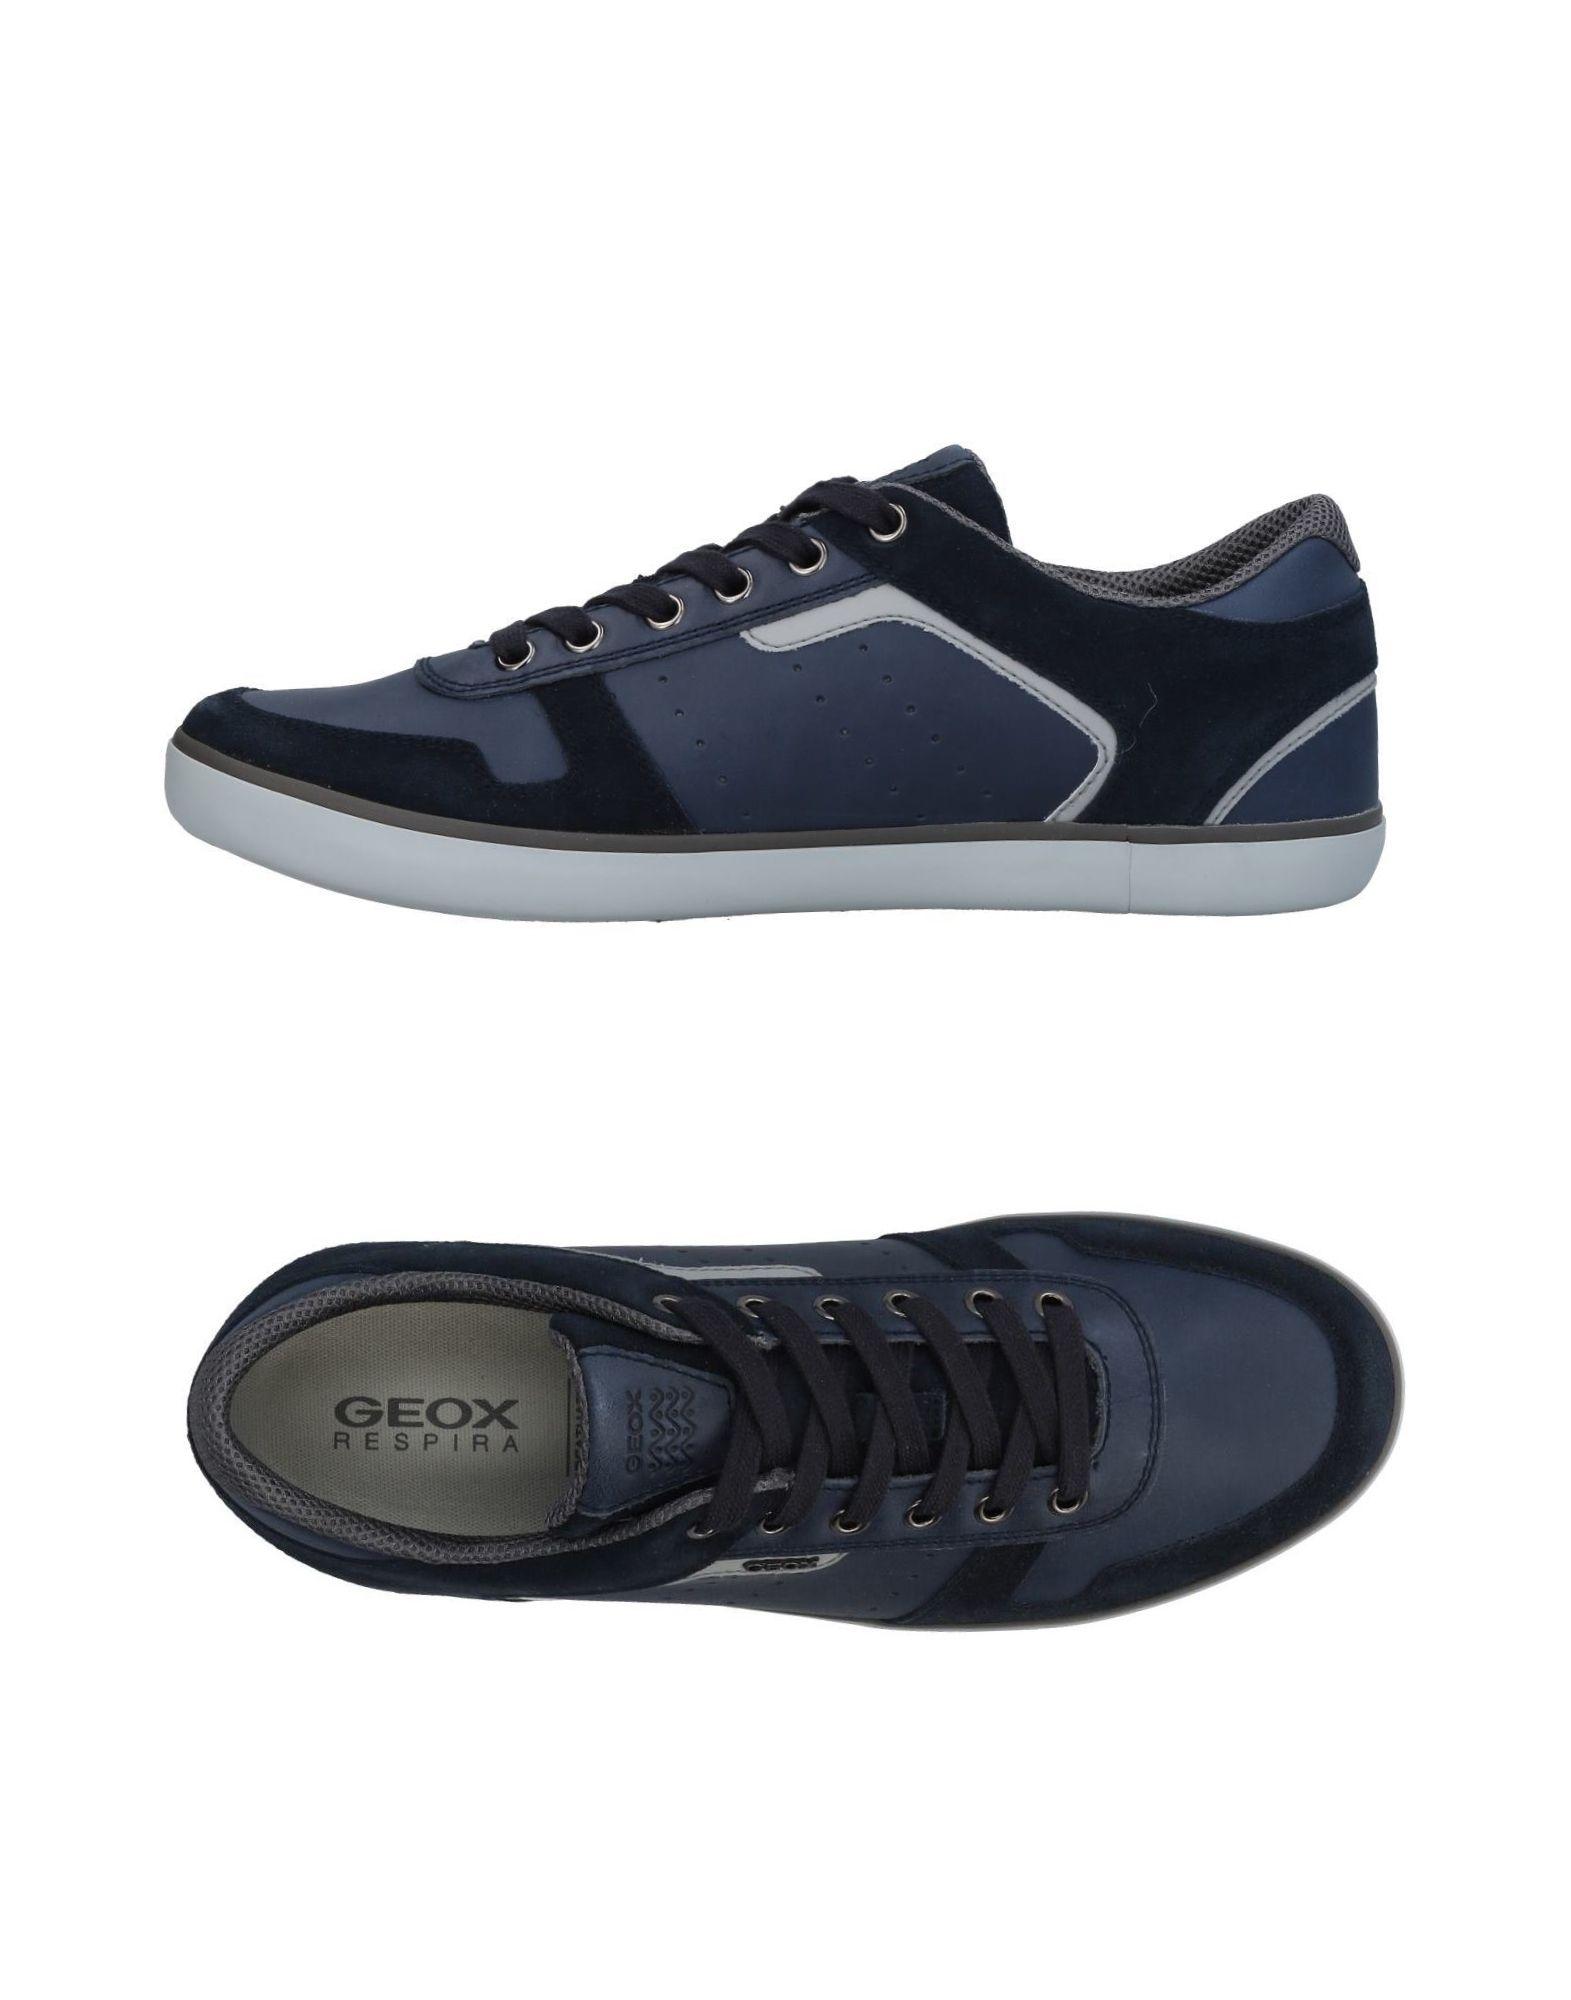 GEOX Herren Low Sneakers & Tennisschuhe Farbe Dunkelblau Größe 9 jetztbilligerkaufen